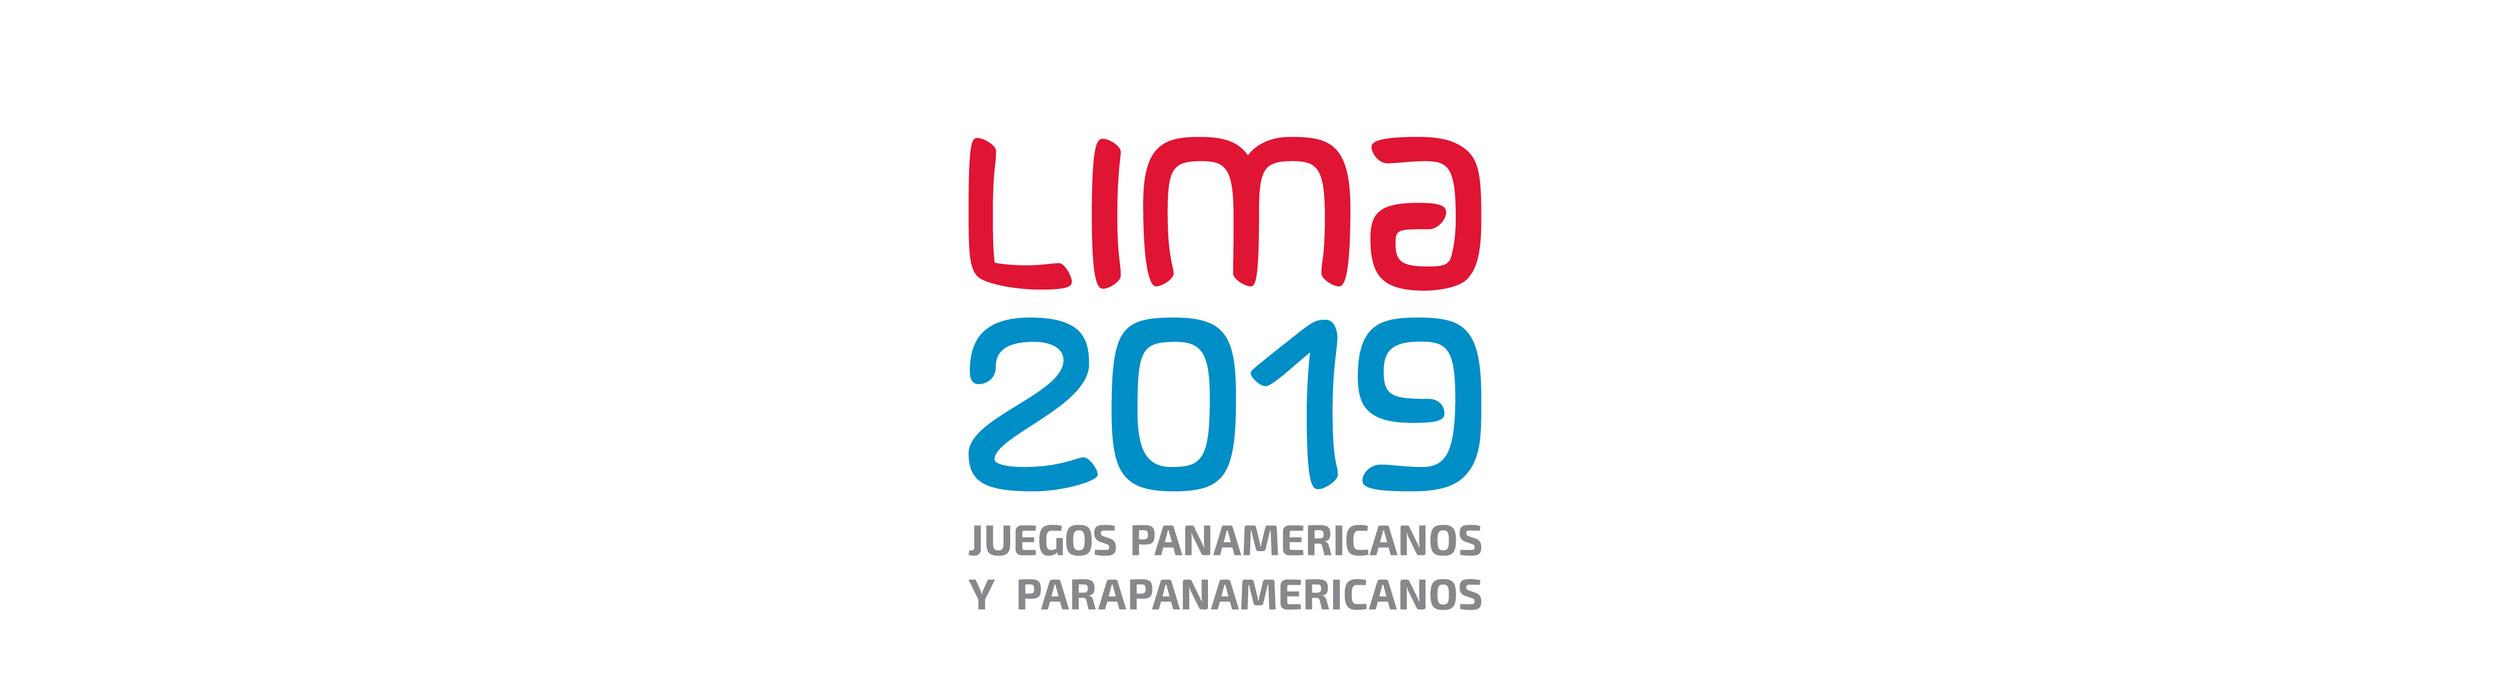 LOGO LIMA 2019-03.png